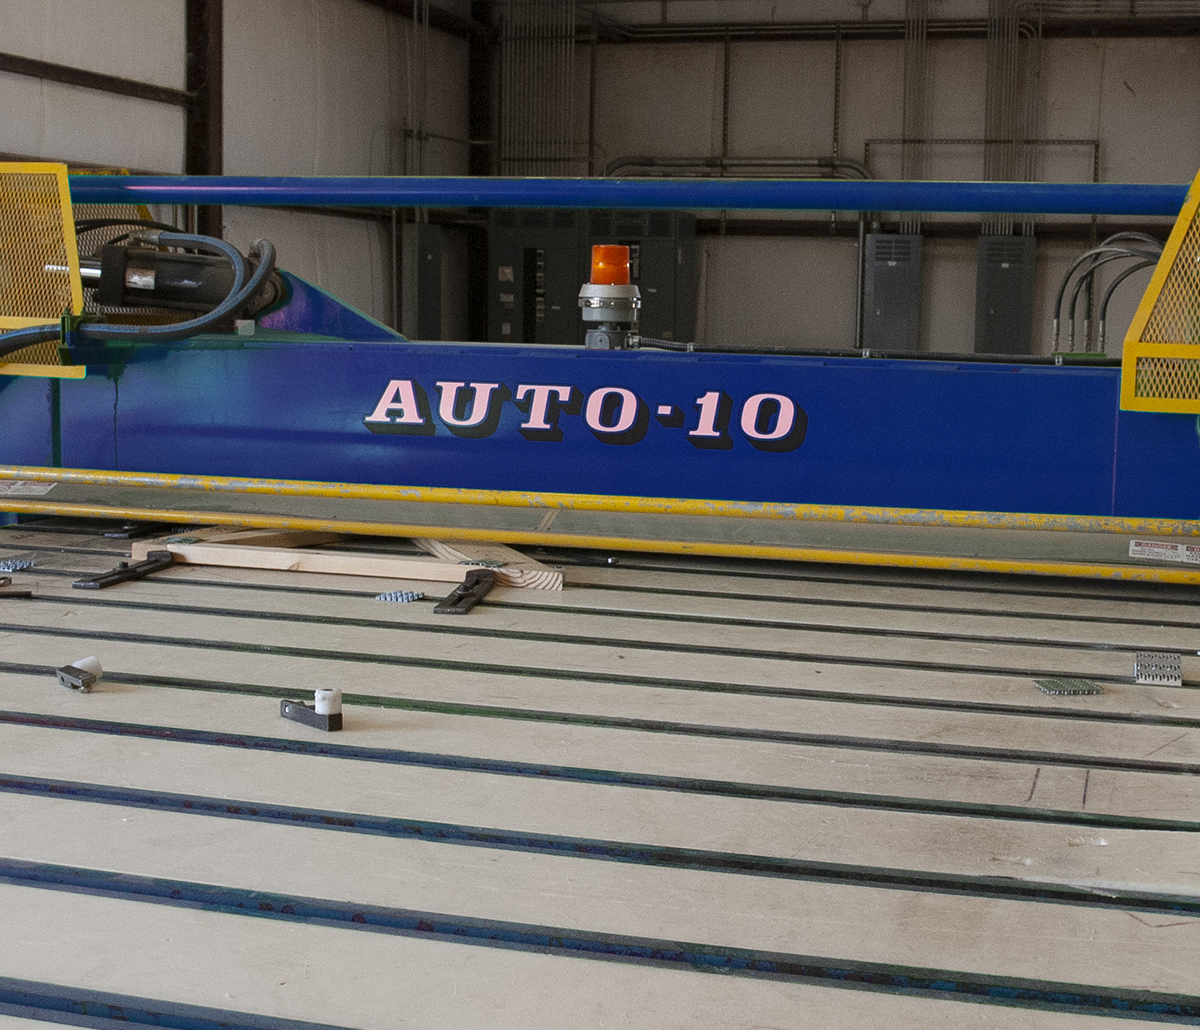 Auto-10 Platen Press Automated Solutions - Auto-10 Platen press in use in warehouse